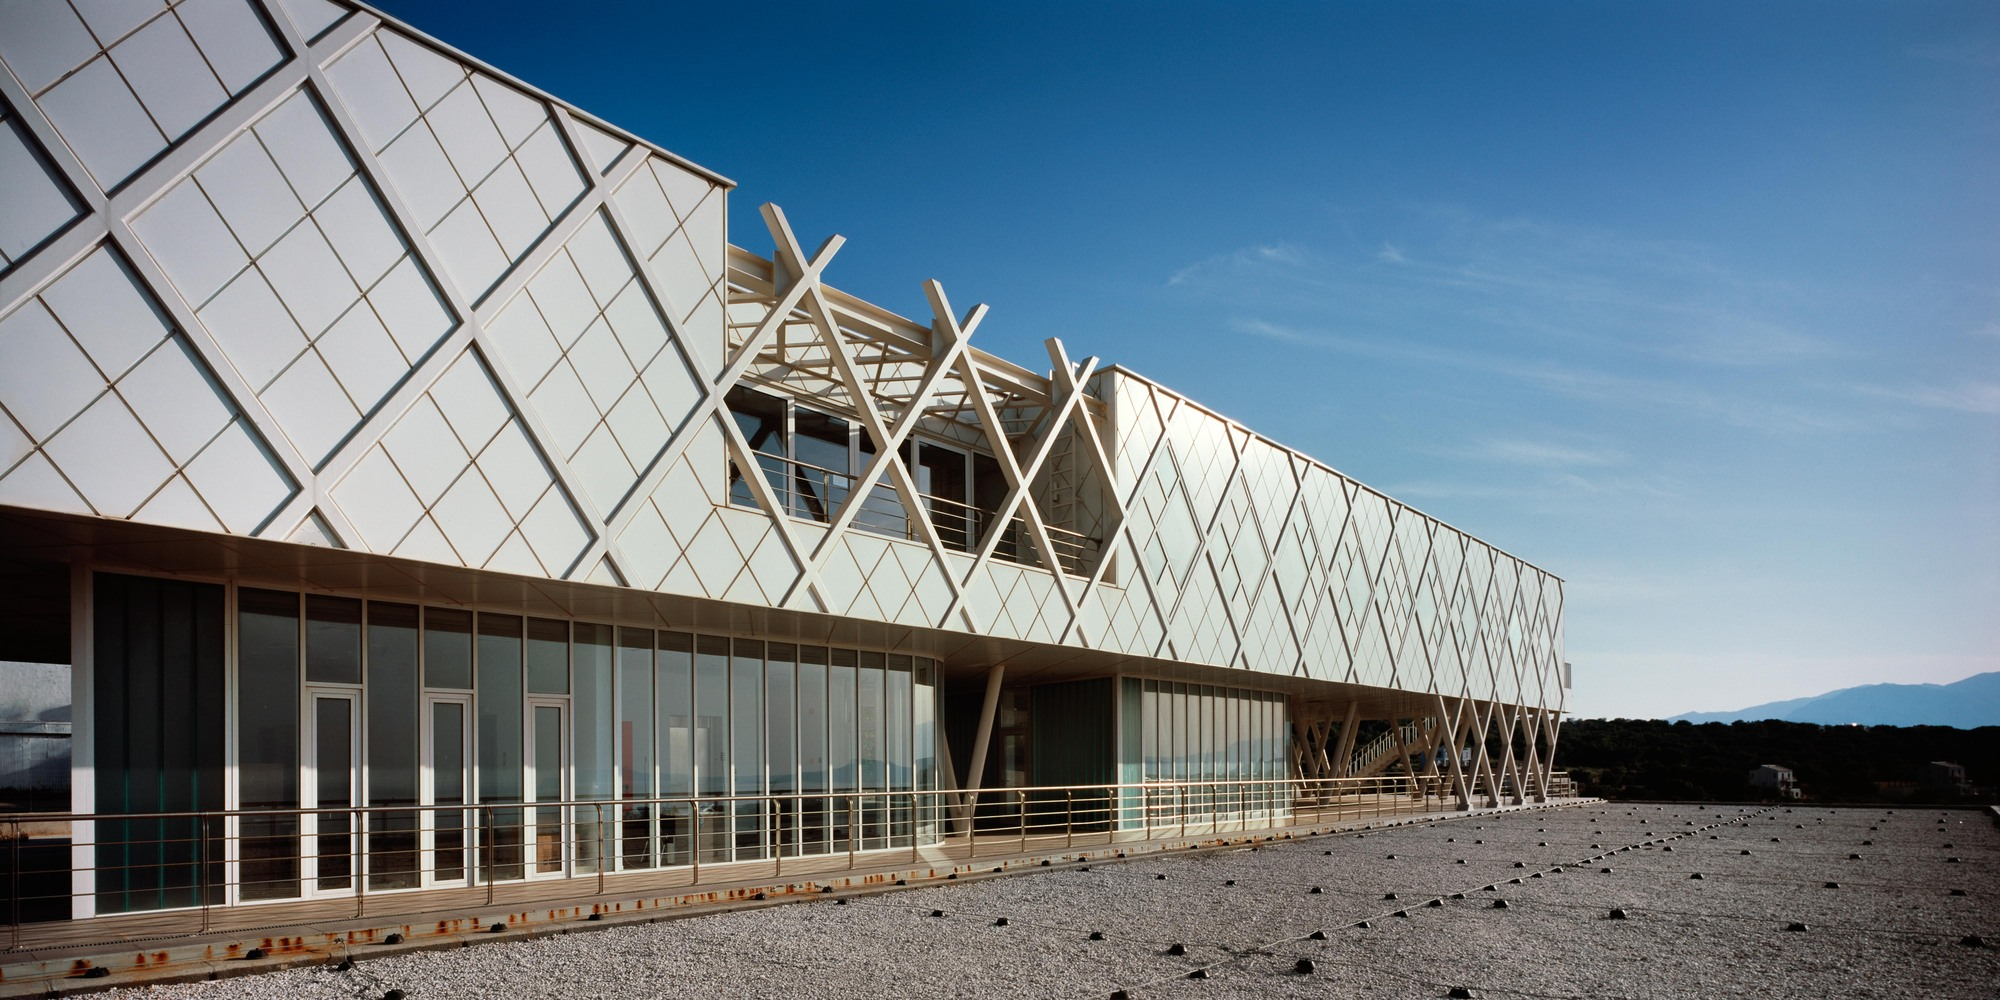 Centre for Plasma Physics and Lasers / Sparch Sakellaridou - Papanikolaou Architects